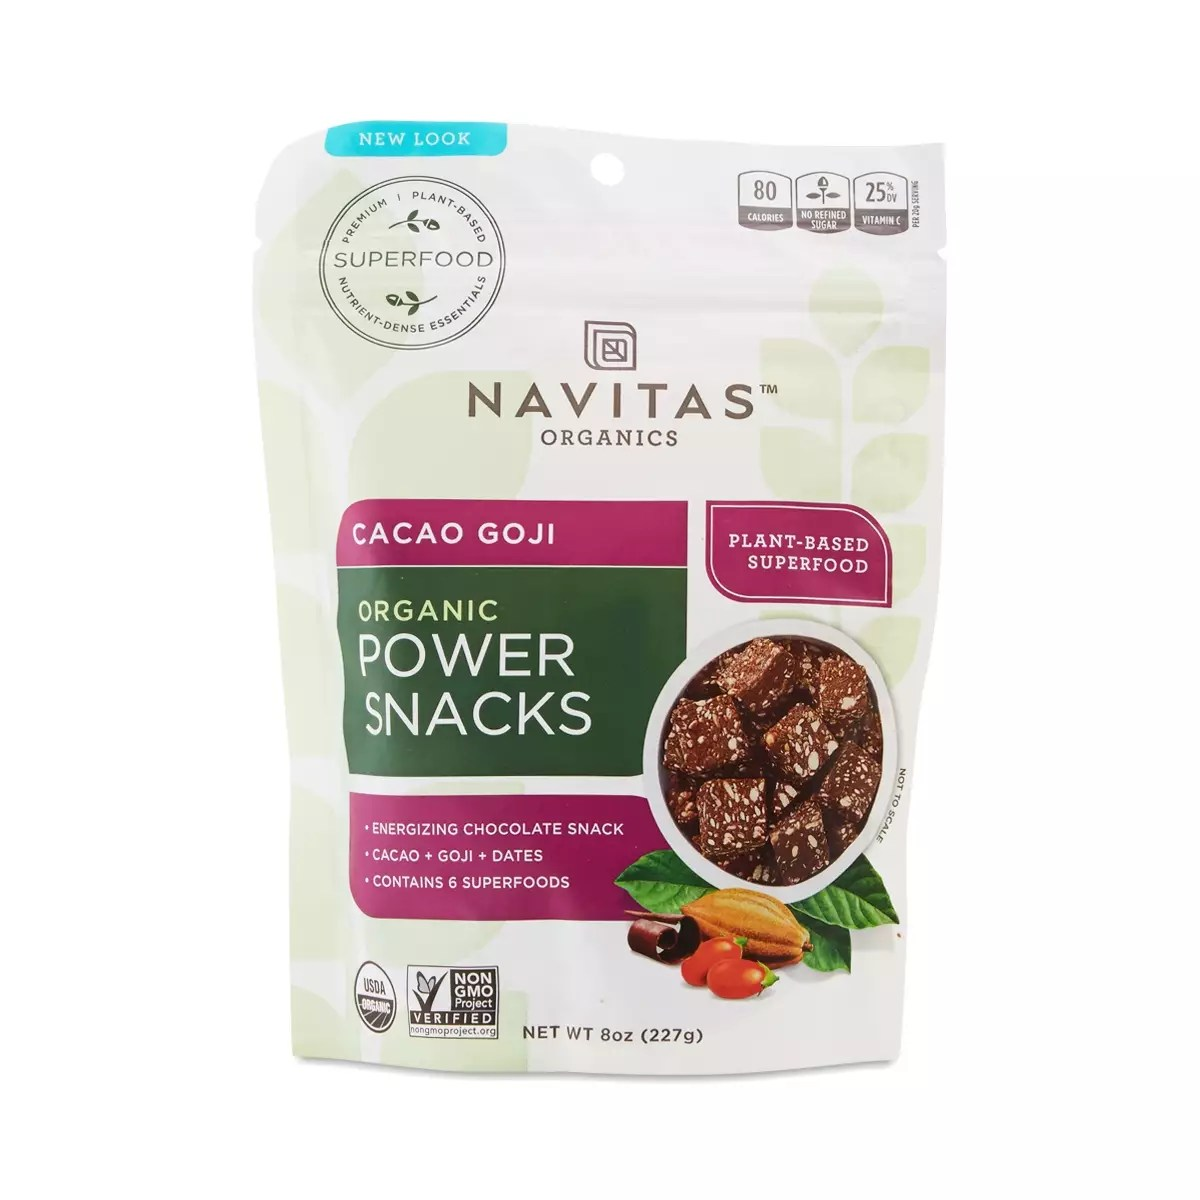 Cacao Goji Power Snacks by Navitas Organics Thrive Market